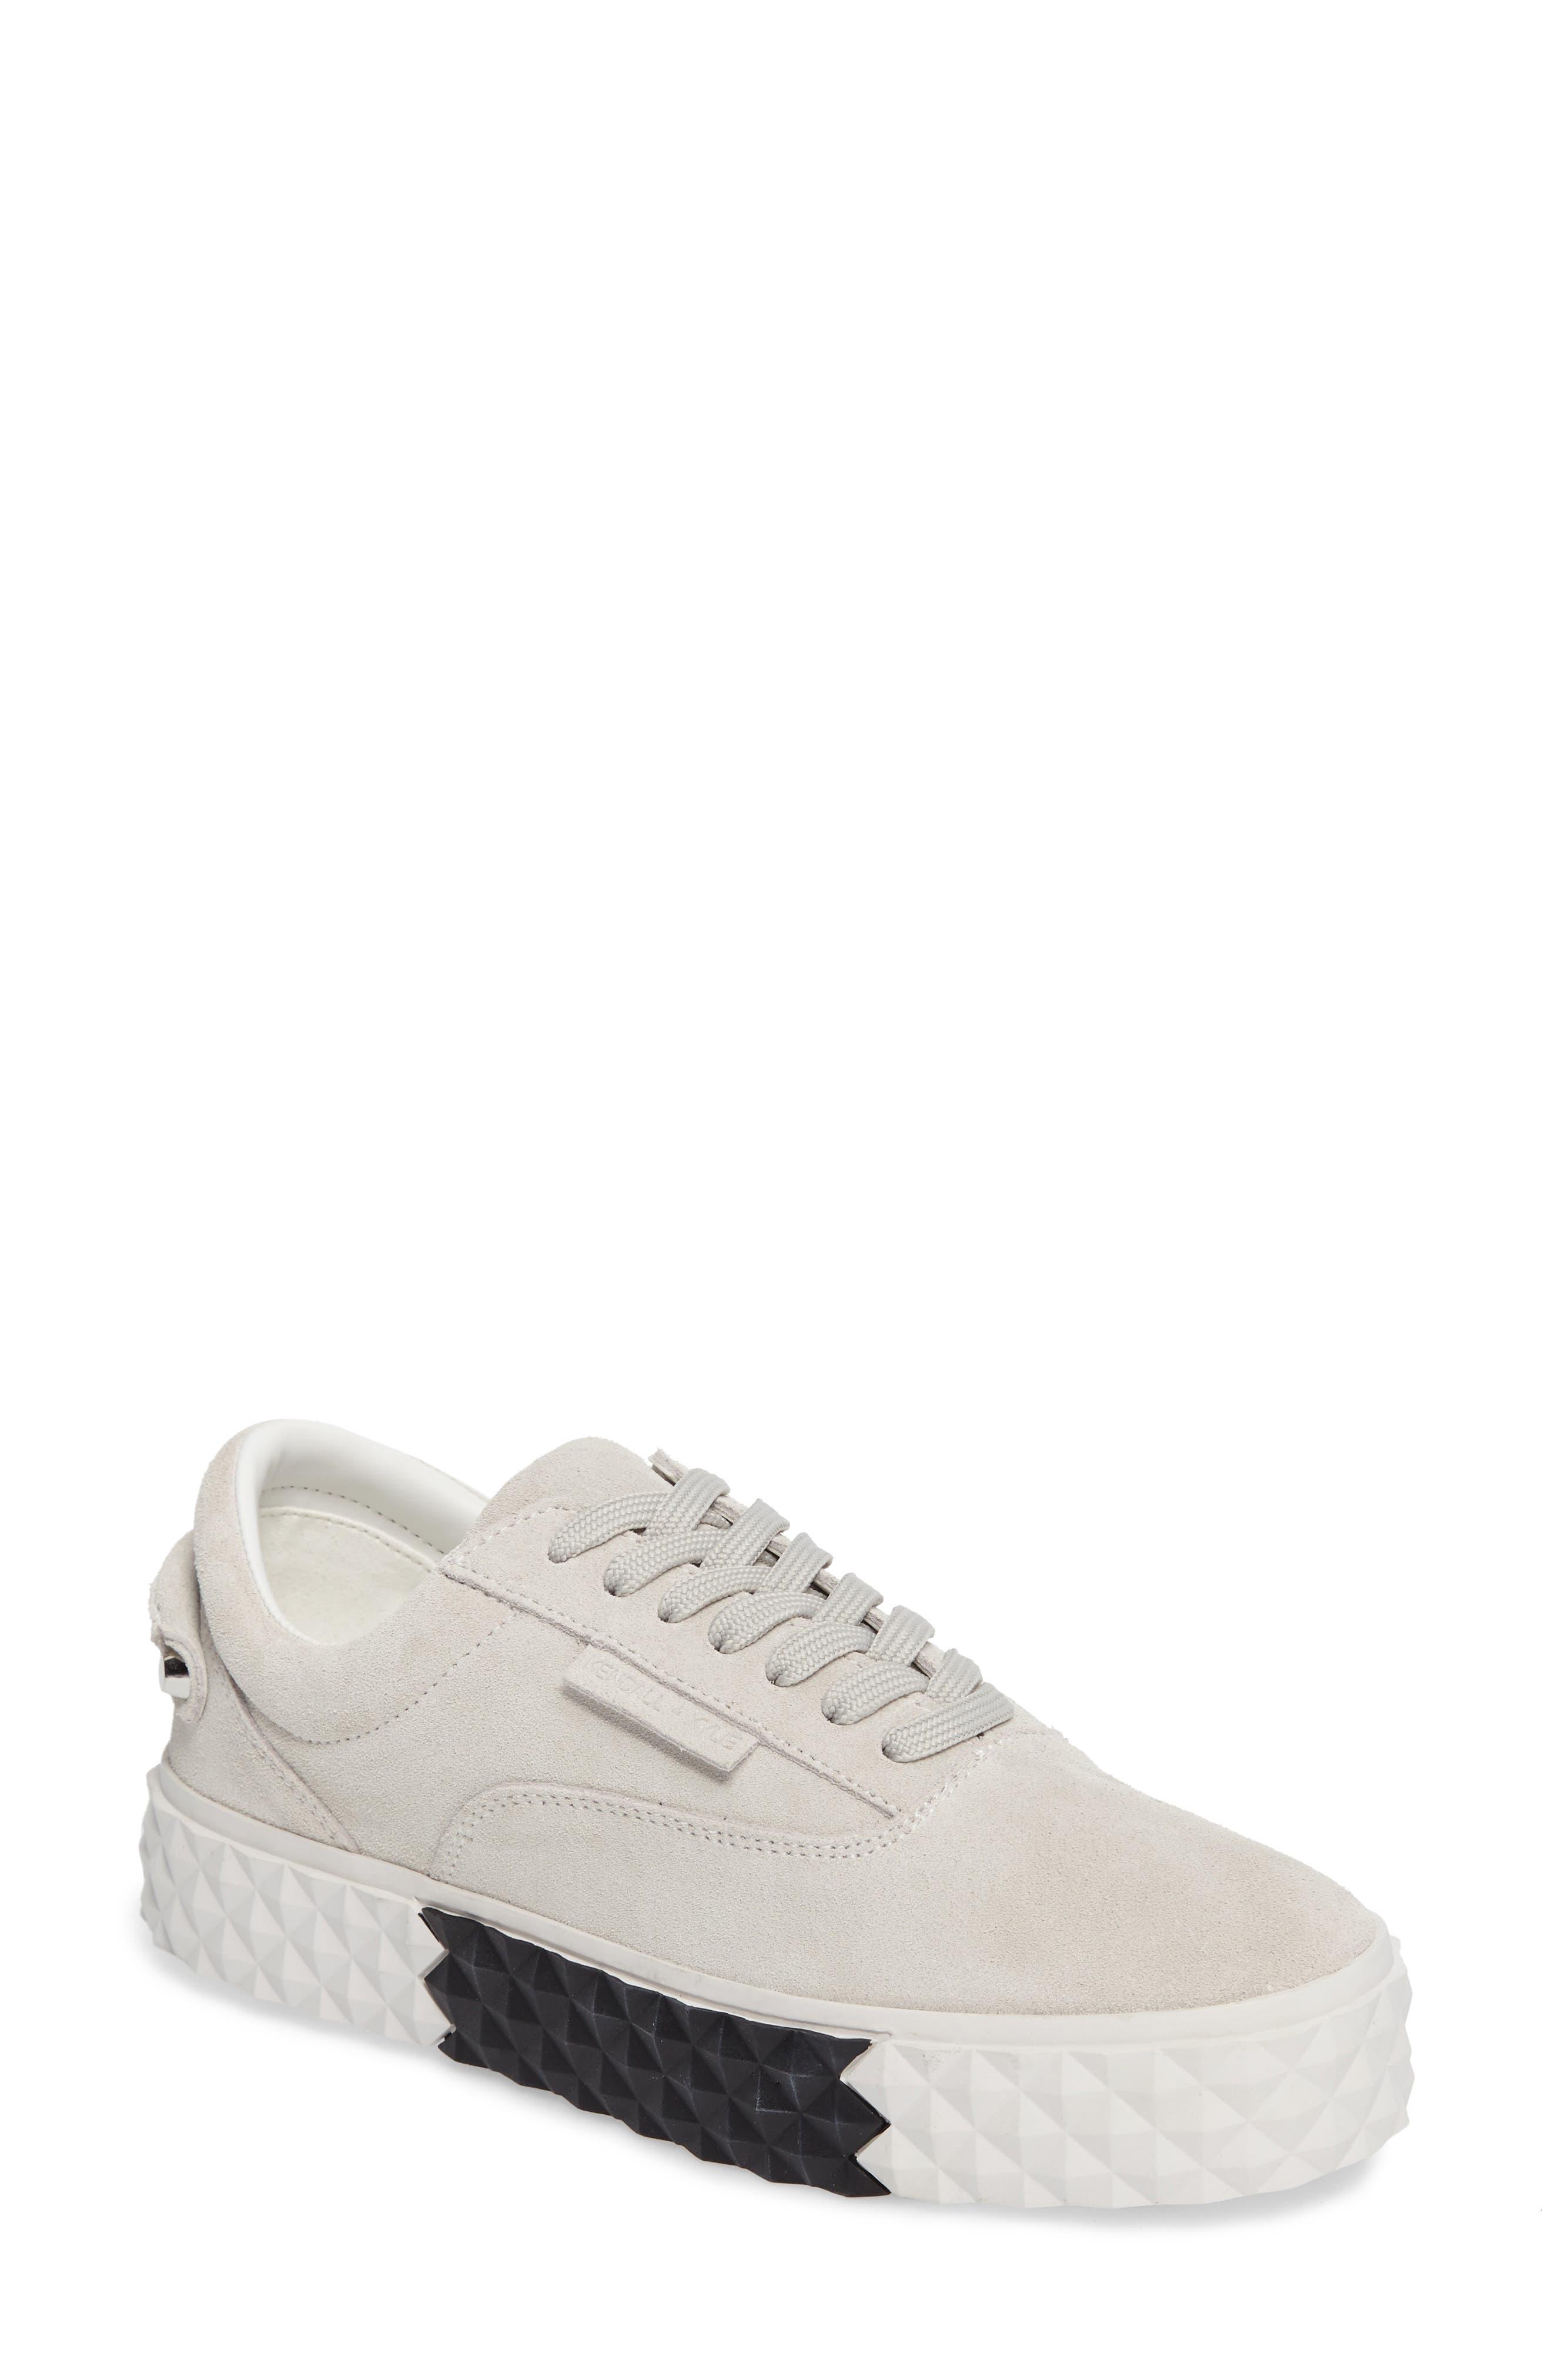 Reign Platform Sneaker,                             Main thumbnail 1, color,                             White